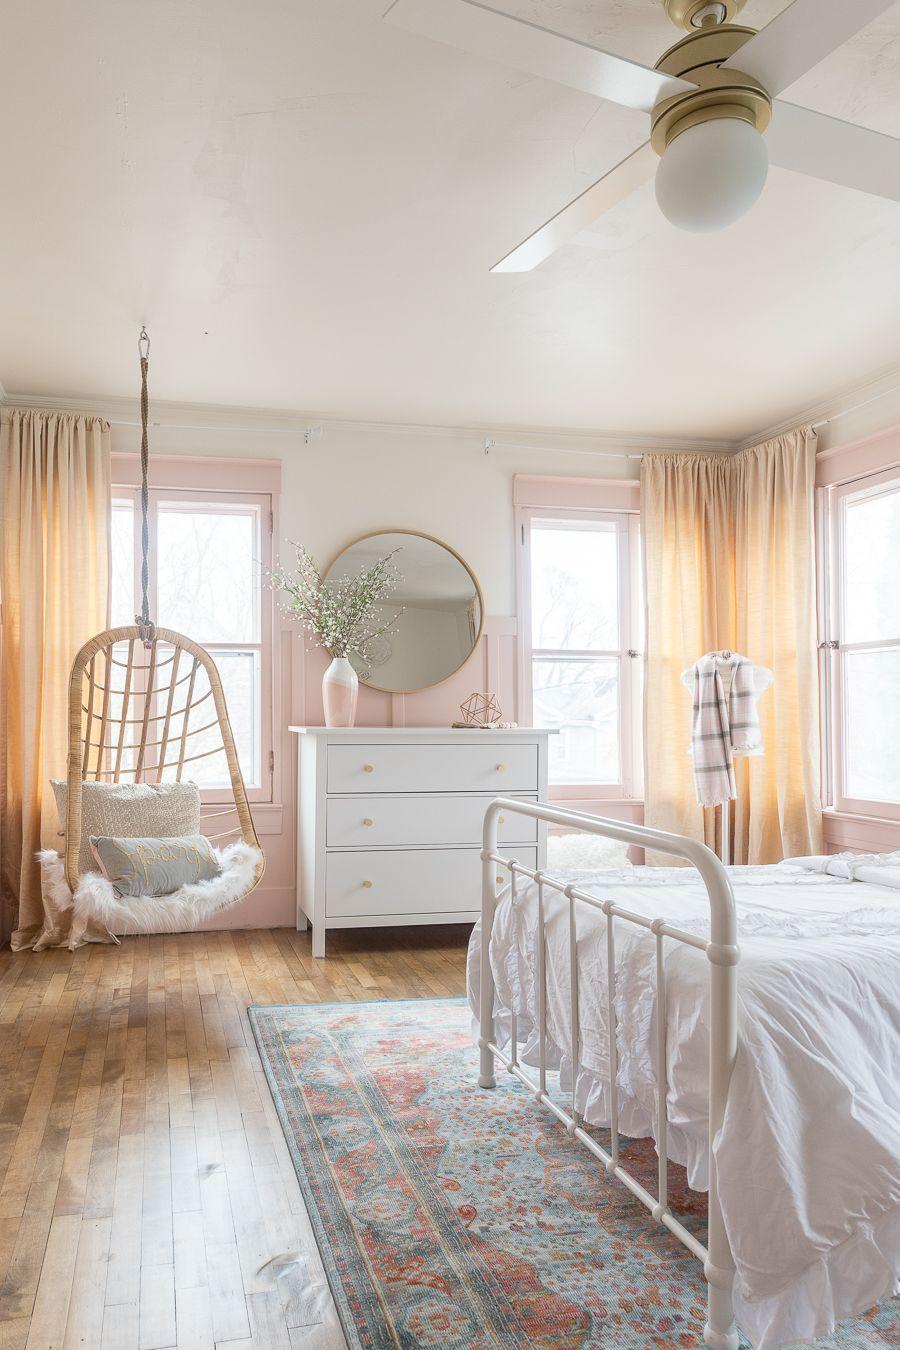 Pink & Gold Girls Bedroom Decor Ideas Girl bedroom